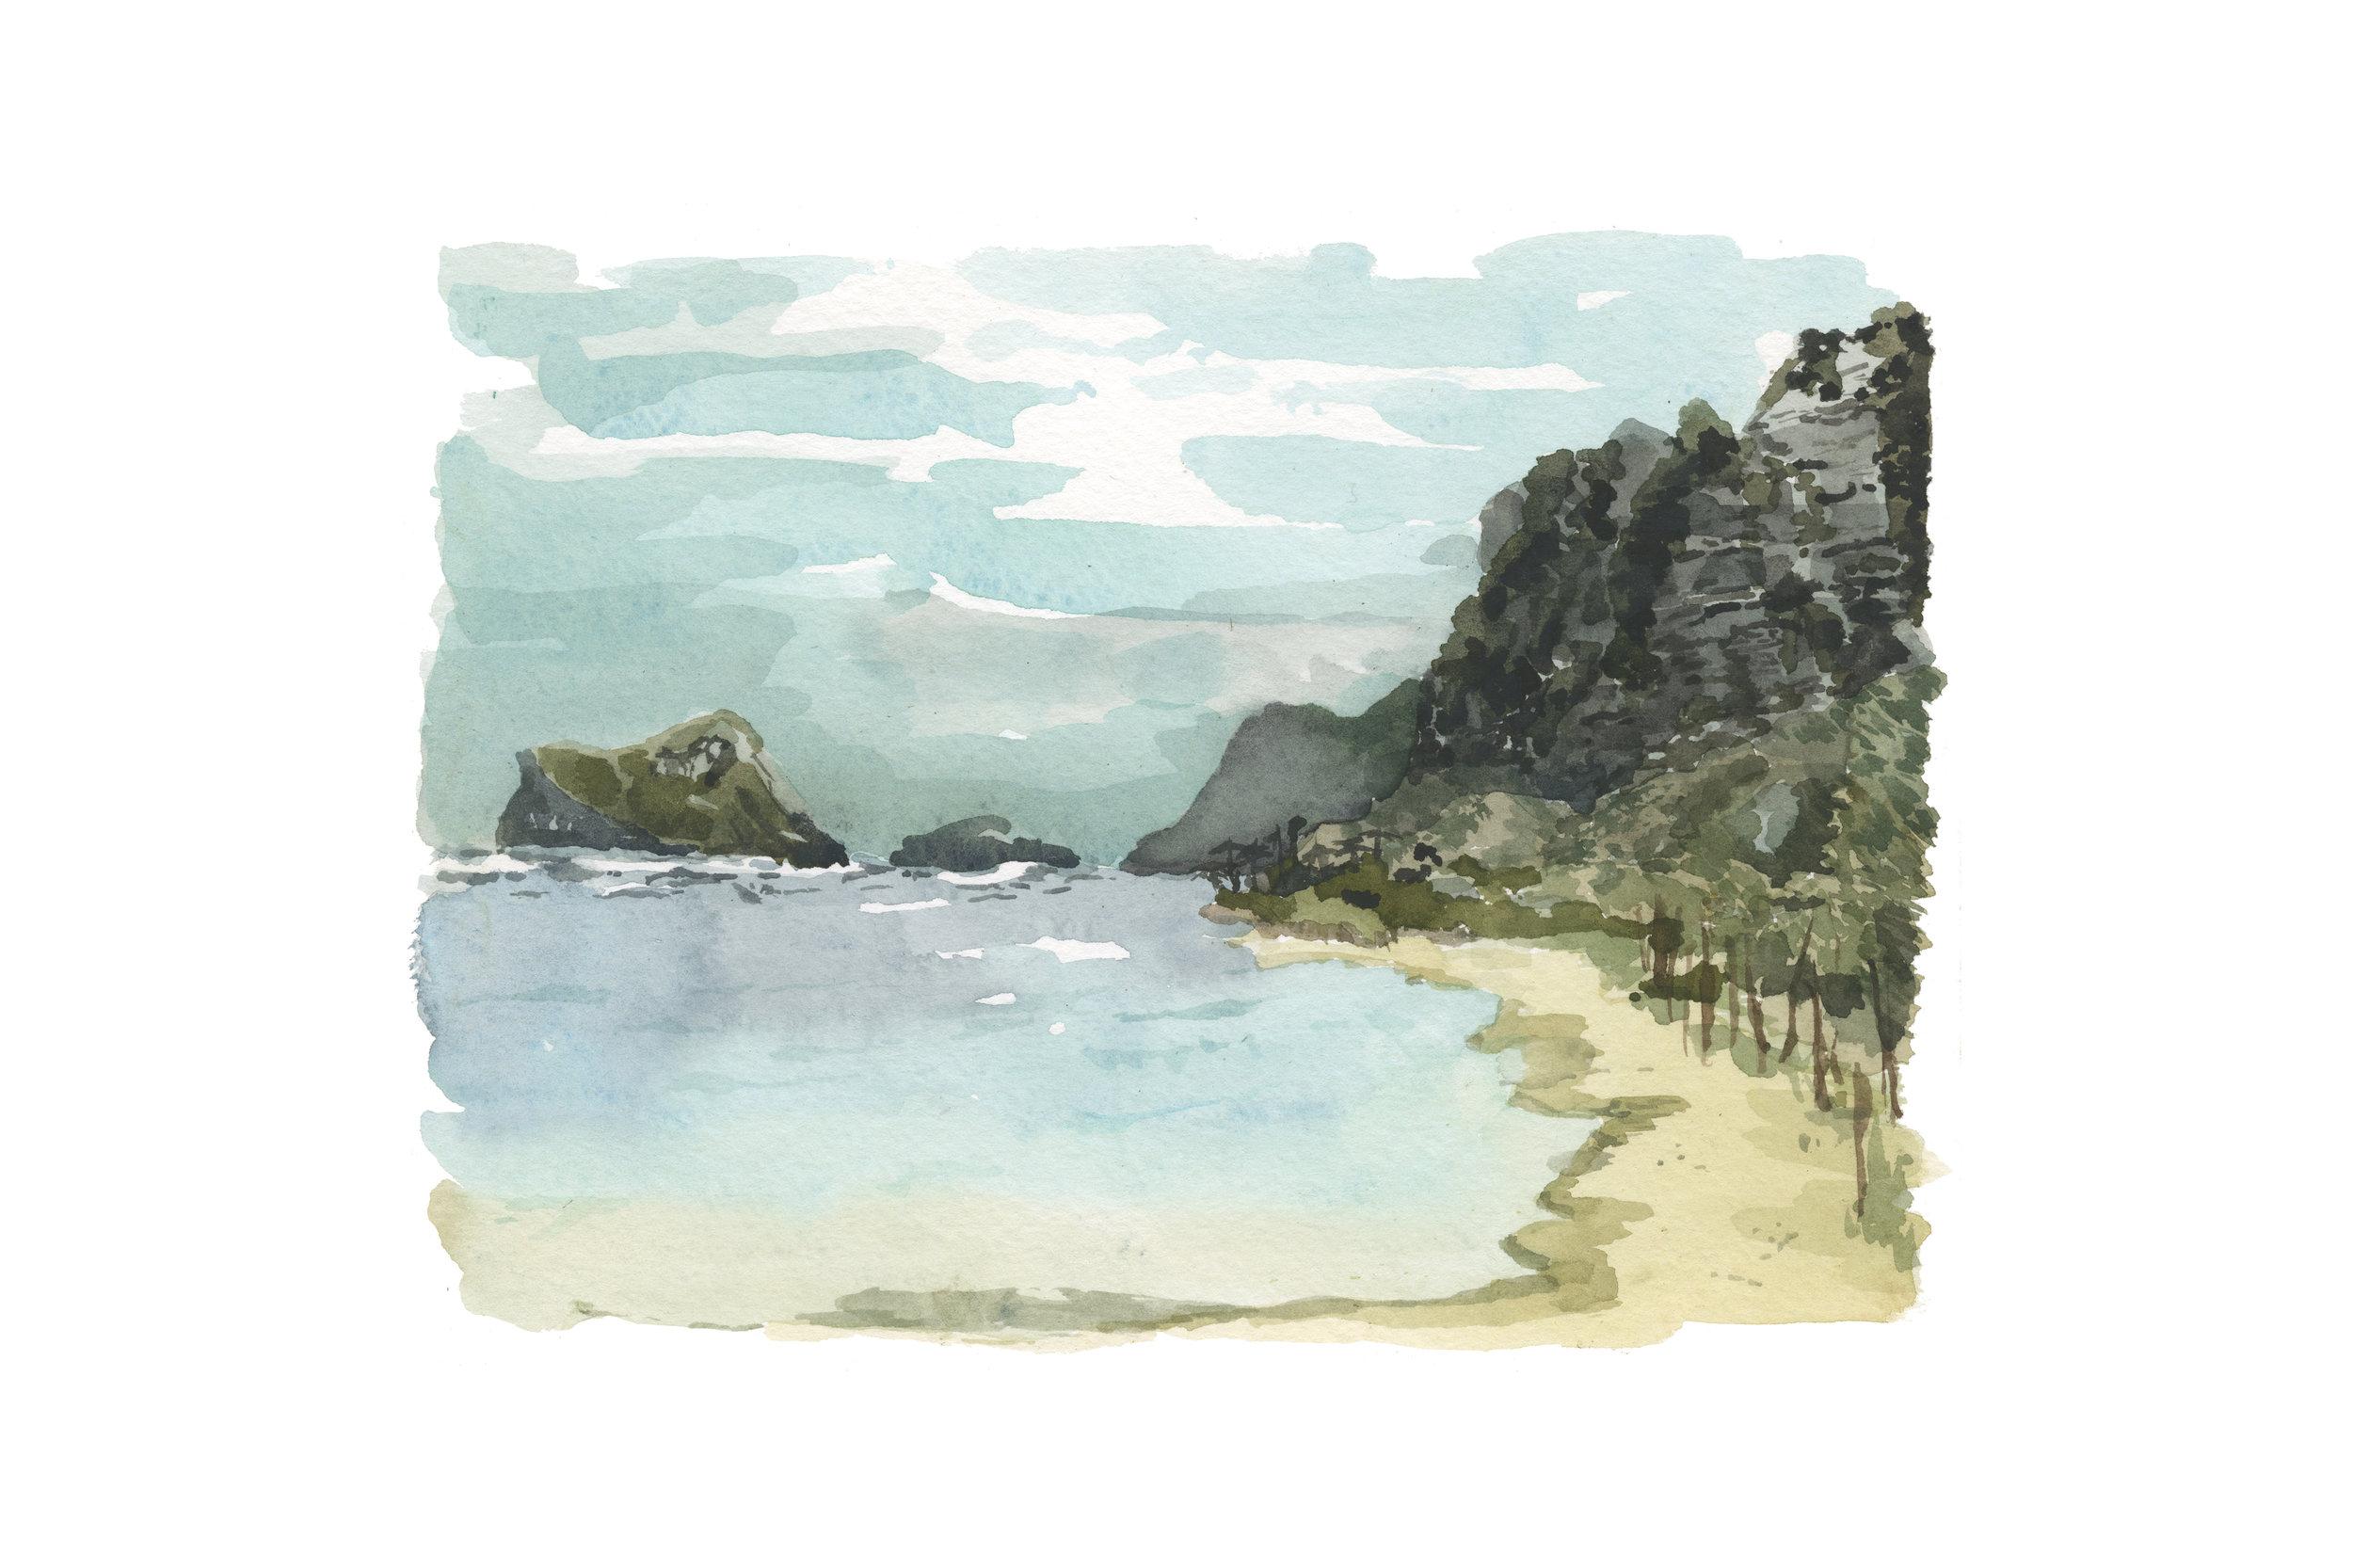 Waimanalo Beach 02.jpg